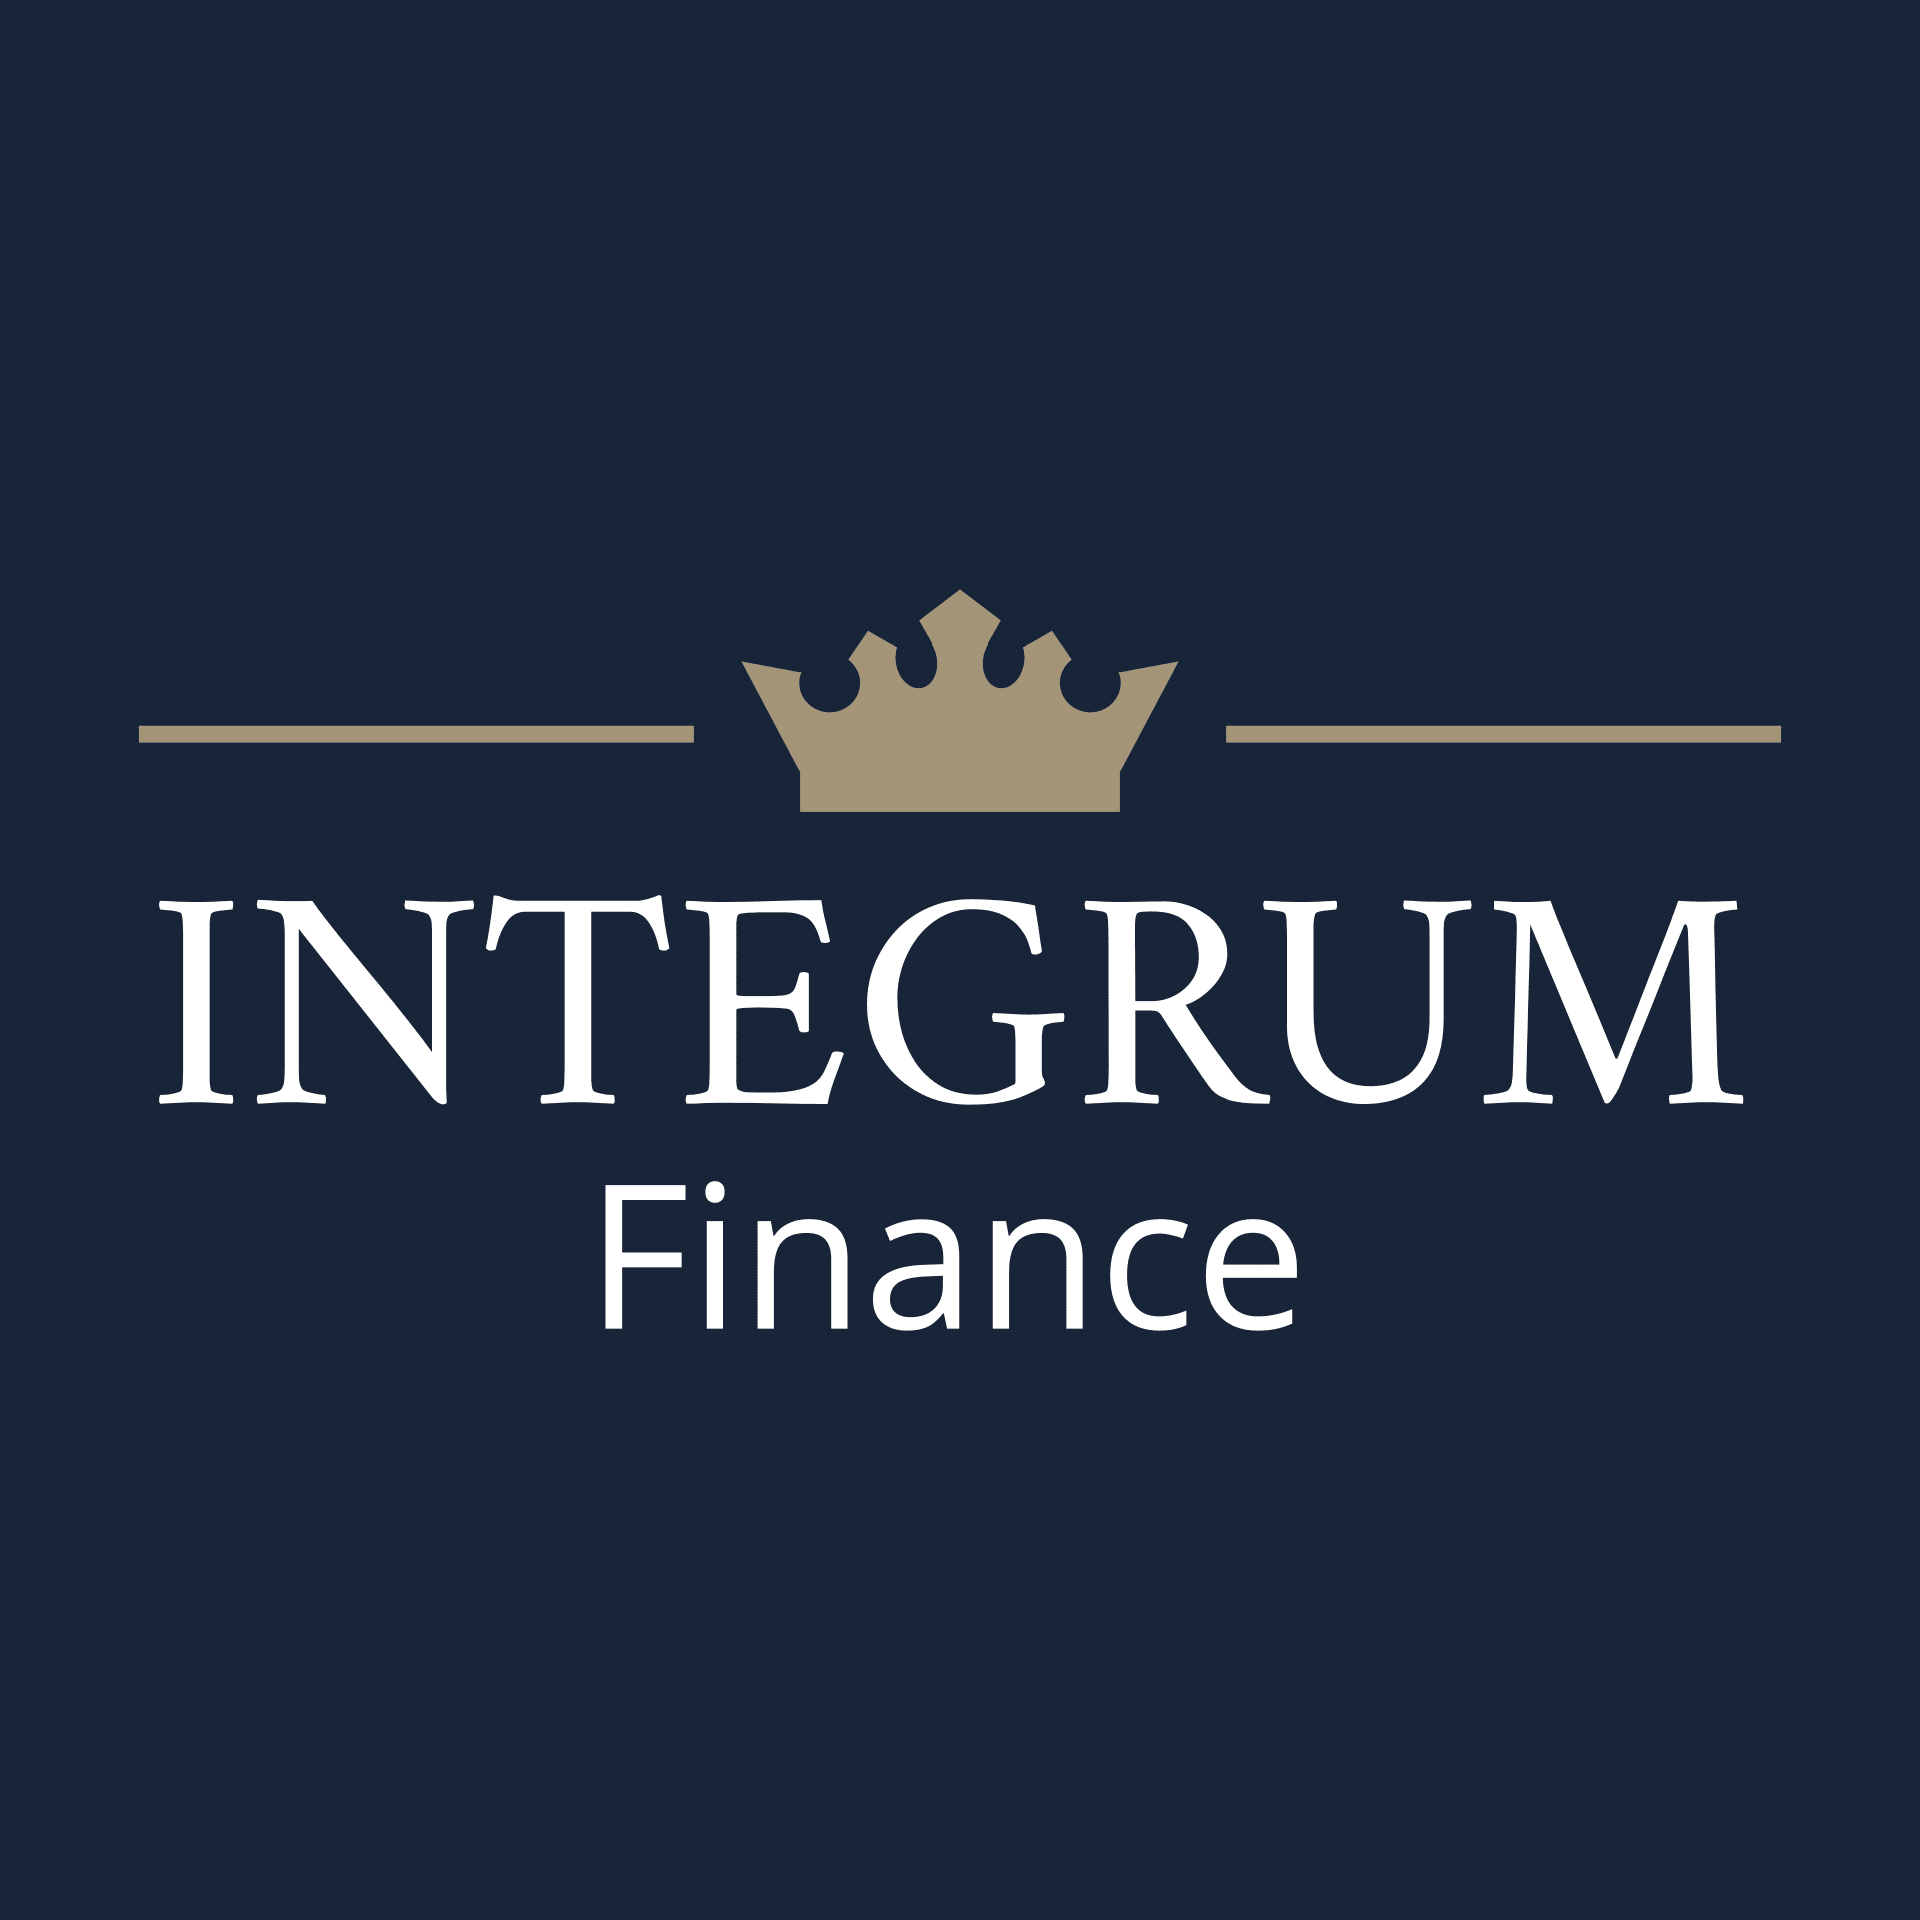 Integrum Finance Ltd